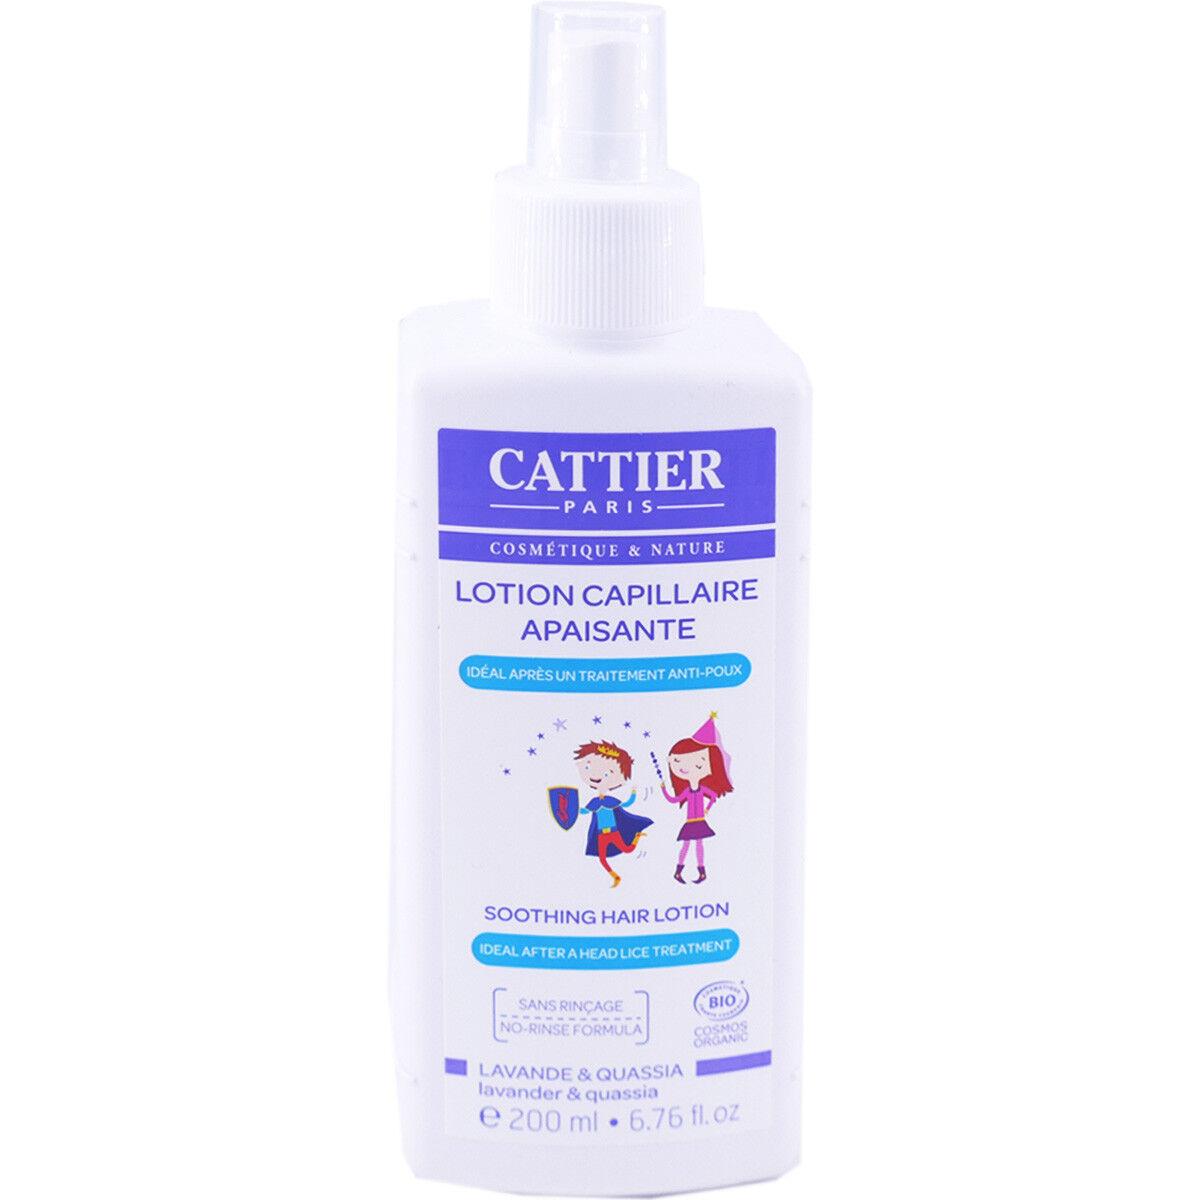 Cattier lotion capillaire apaisante bio 200ml